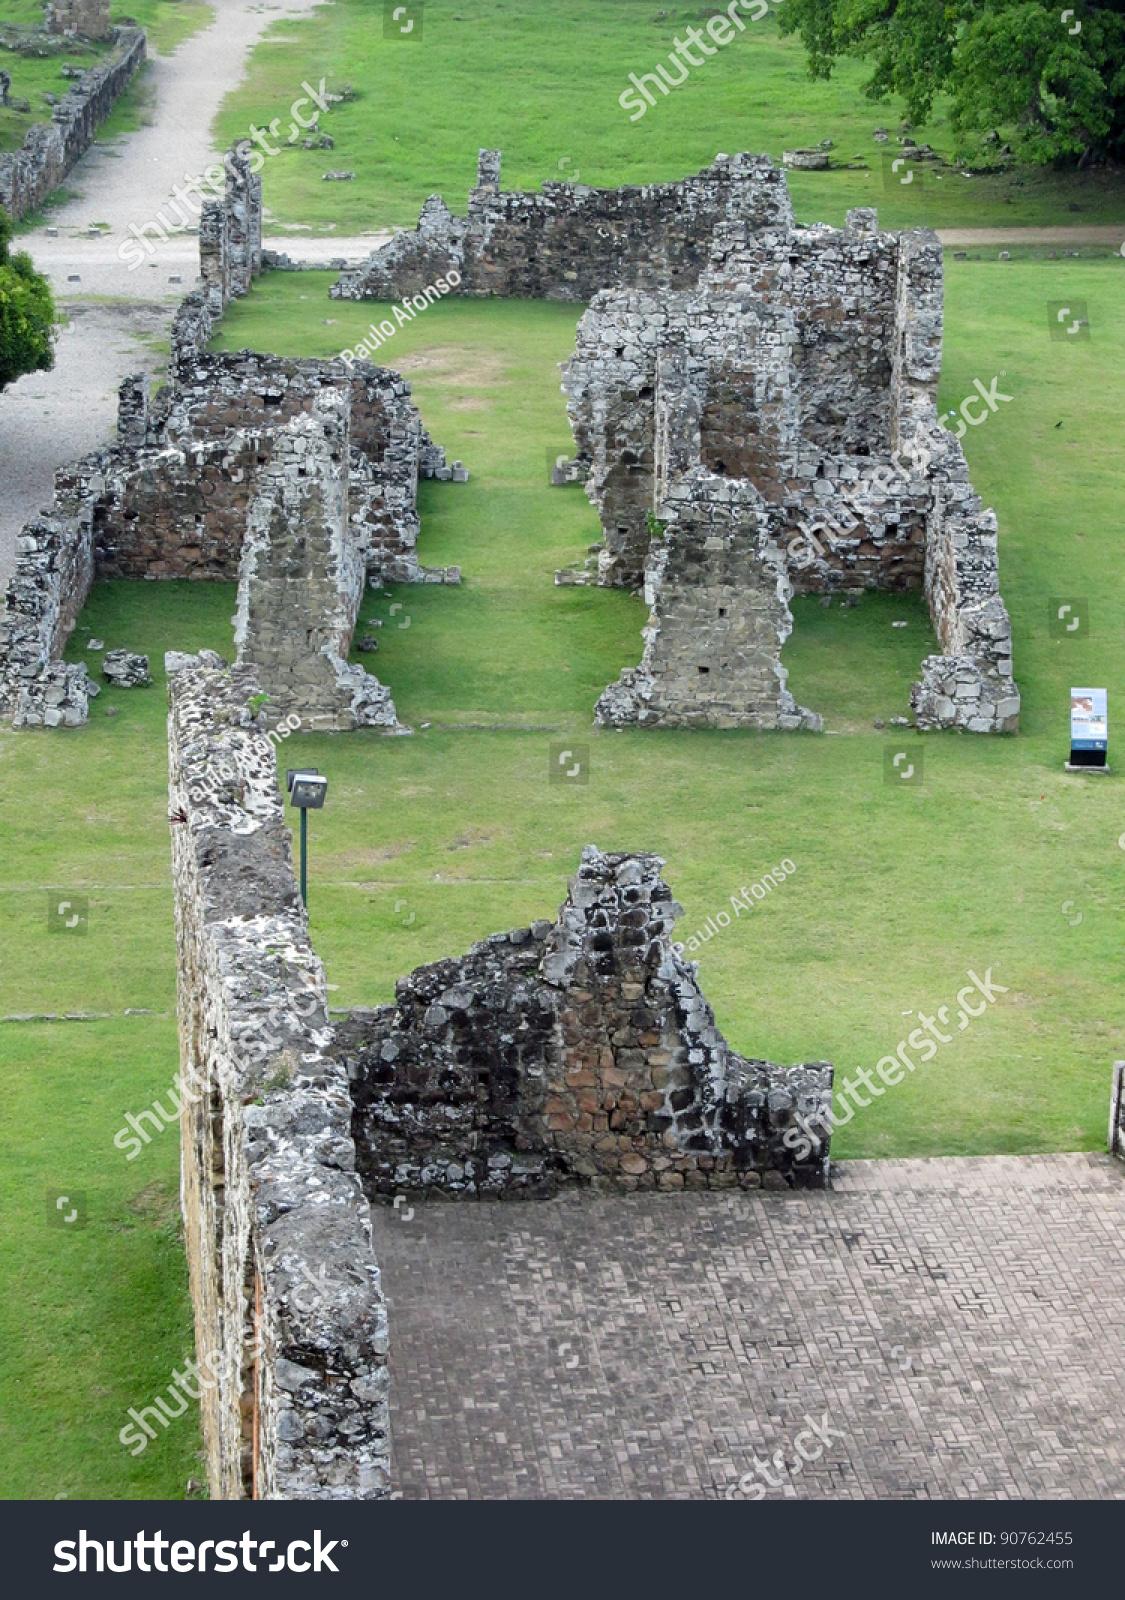 Panama la vieja old spanish city unesco heritage ruins for The bishop house